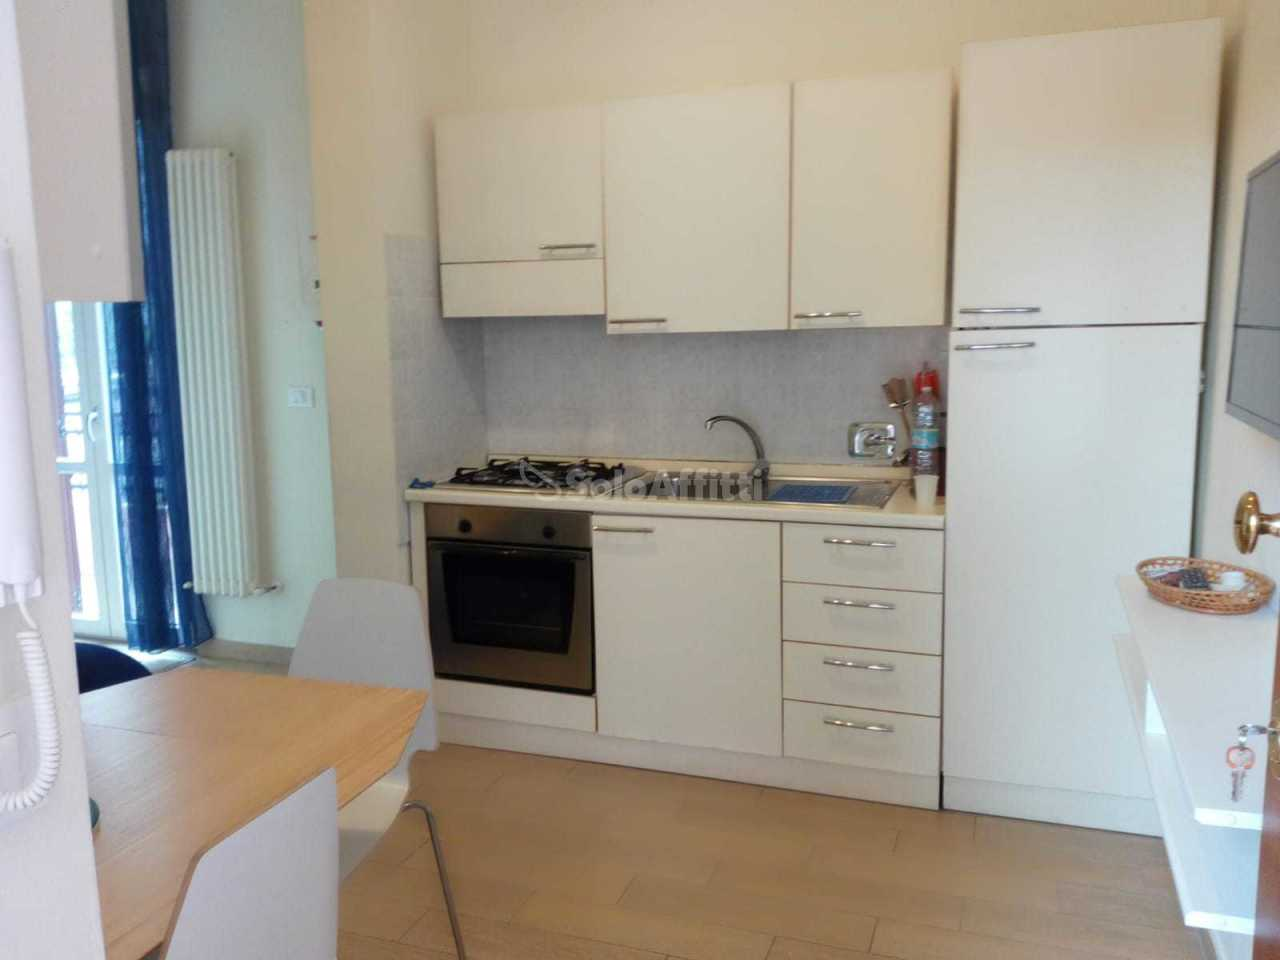 Appartamento, tiburtina, Affitto/Cessione - Pescara